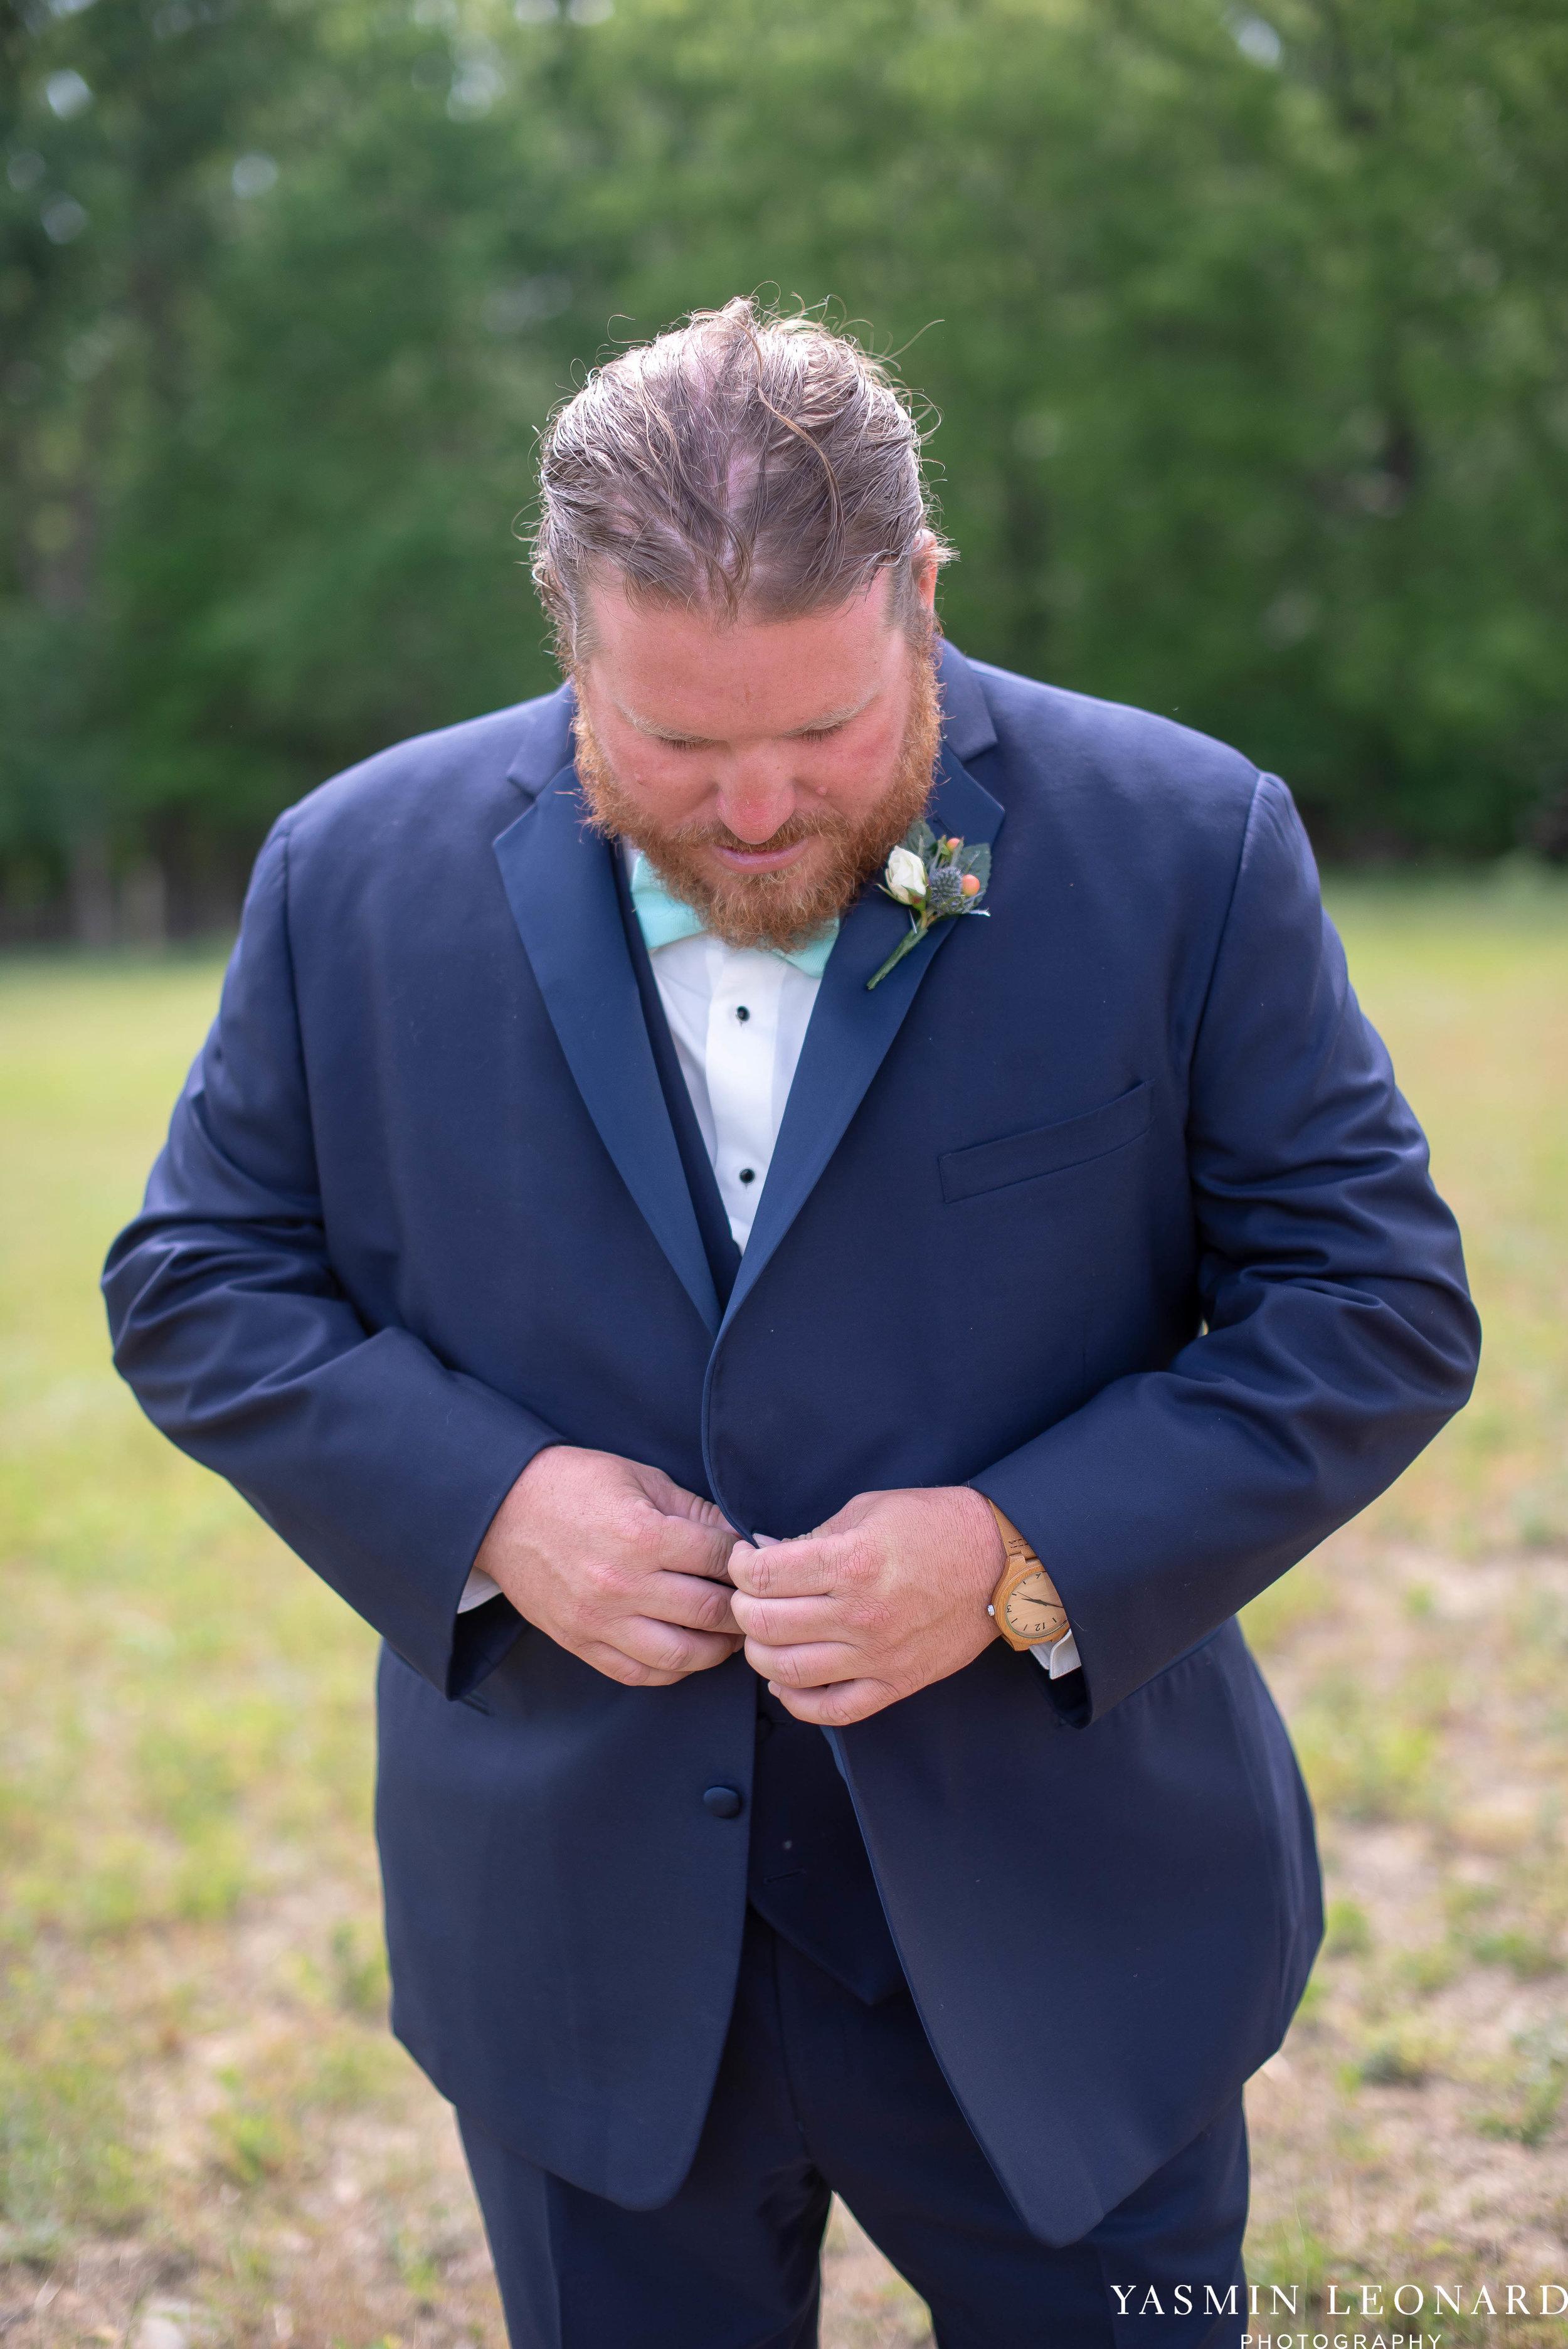 Rain on your wedding day - Rainy Wedding - Plan B for Rain - What to do if it rains on your wedding day - Wedding Inspiration - Outdoor wedding ideas - Rainy Wedding Pictures - Yasmin Leonard Photography-9.jpg